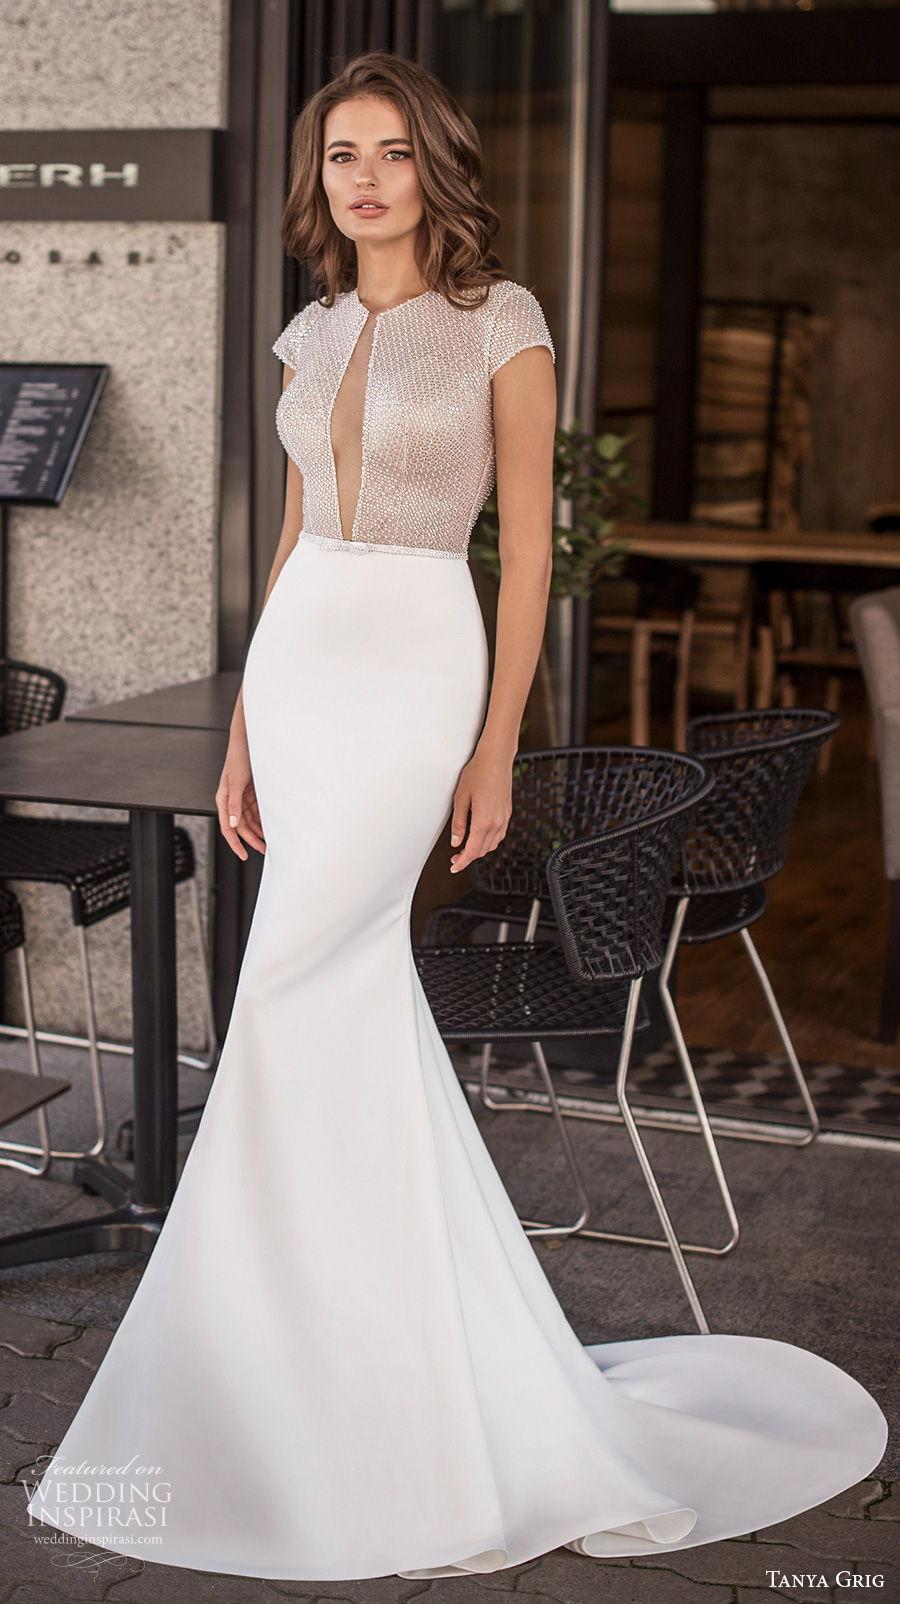 tanya grig 2021 bridal cap sleeves jewel keyhole bodice glamorous sexy fit and flare wedding dress keyhole low back medium train (2) mv